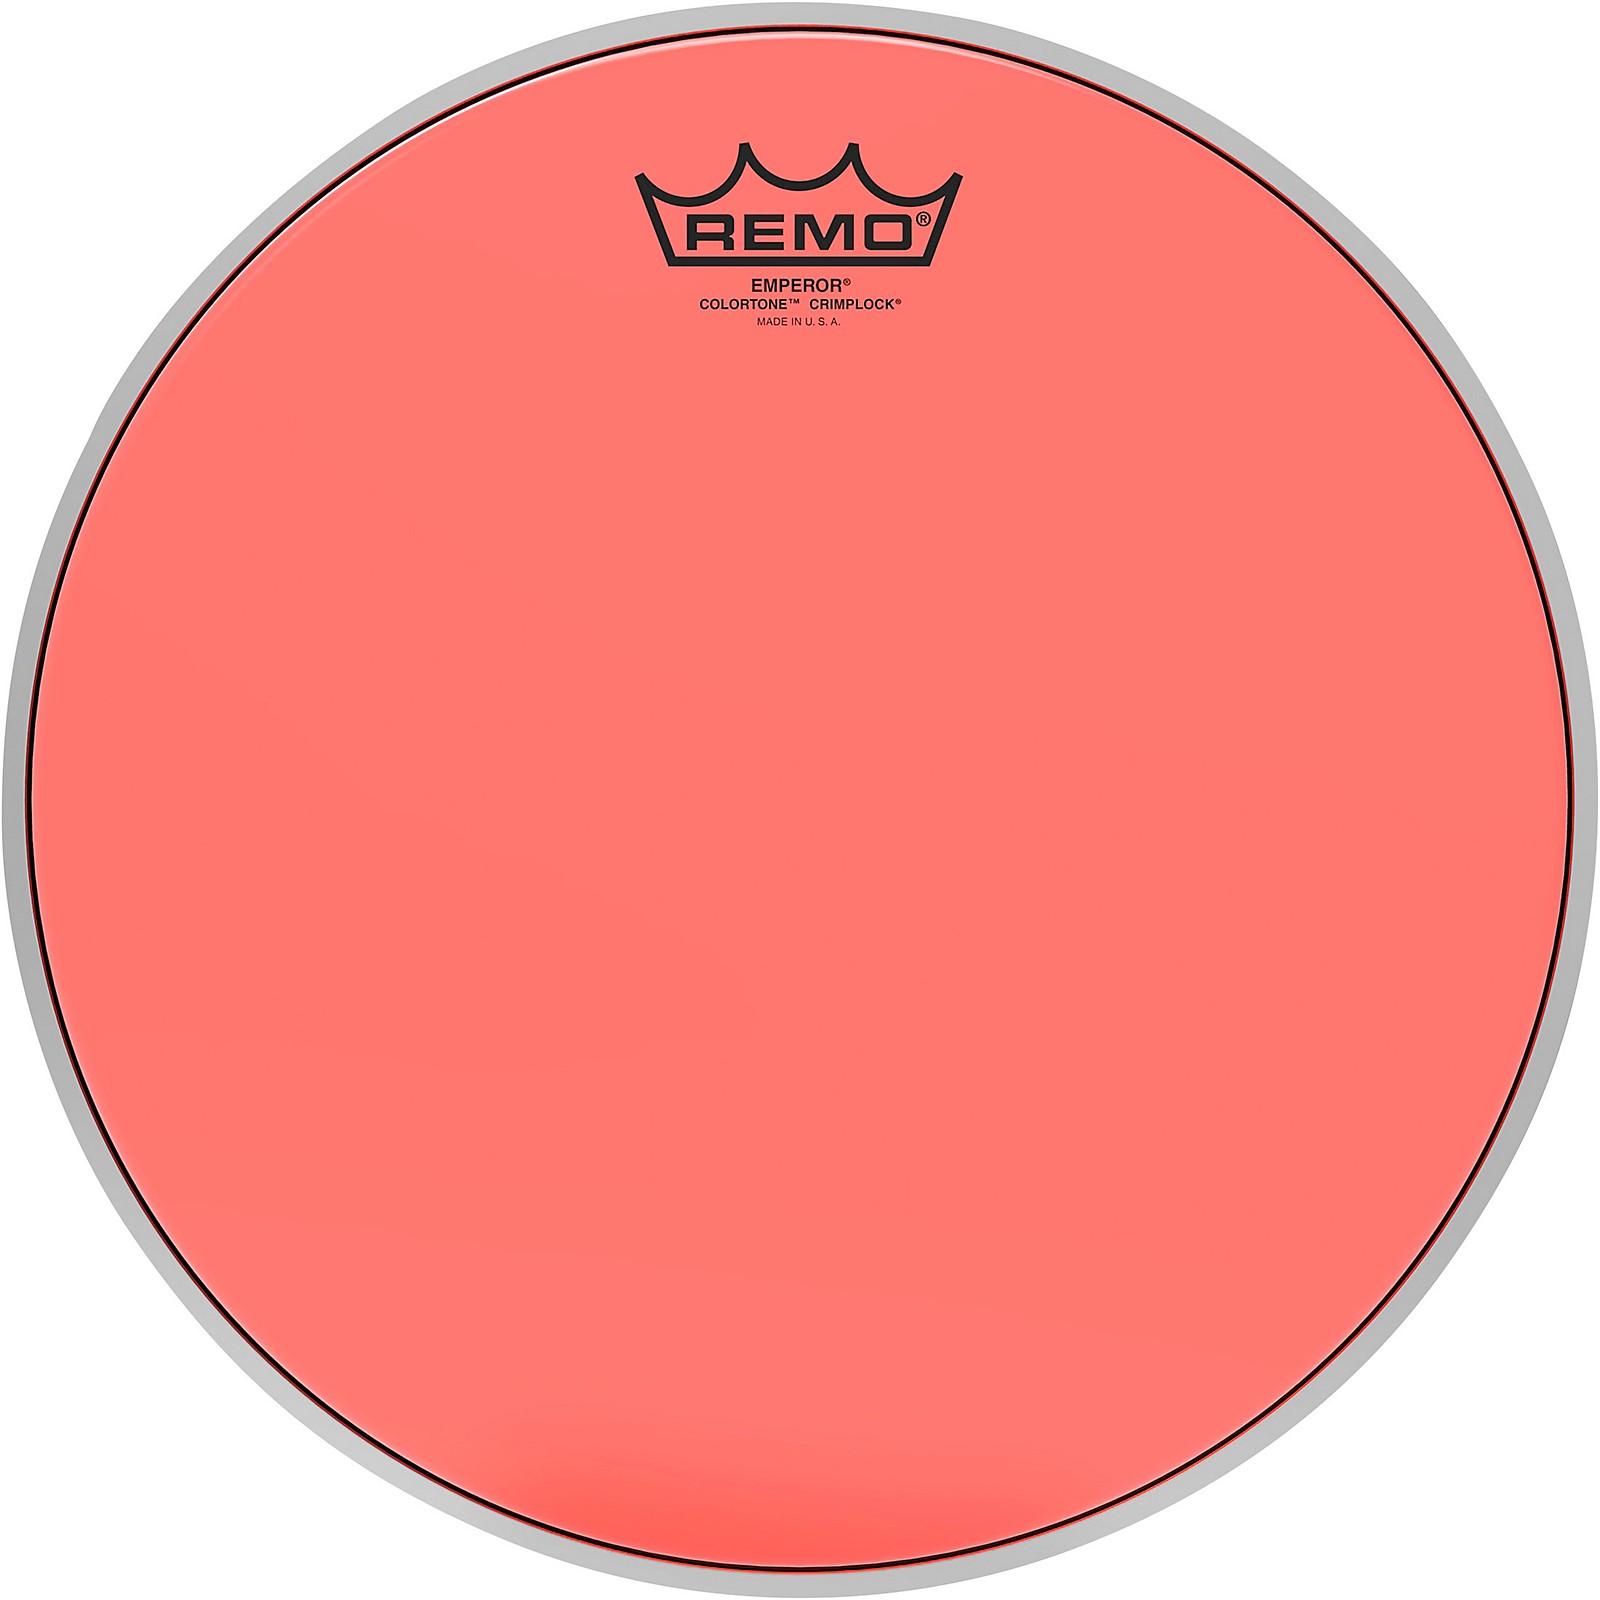 Remo Emperor Colortone Crimplock Red Tenor Drum Head